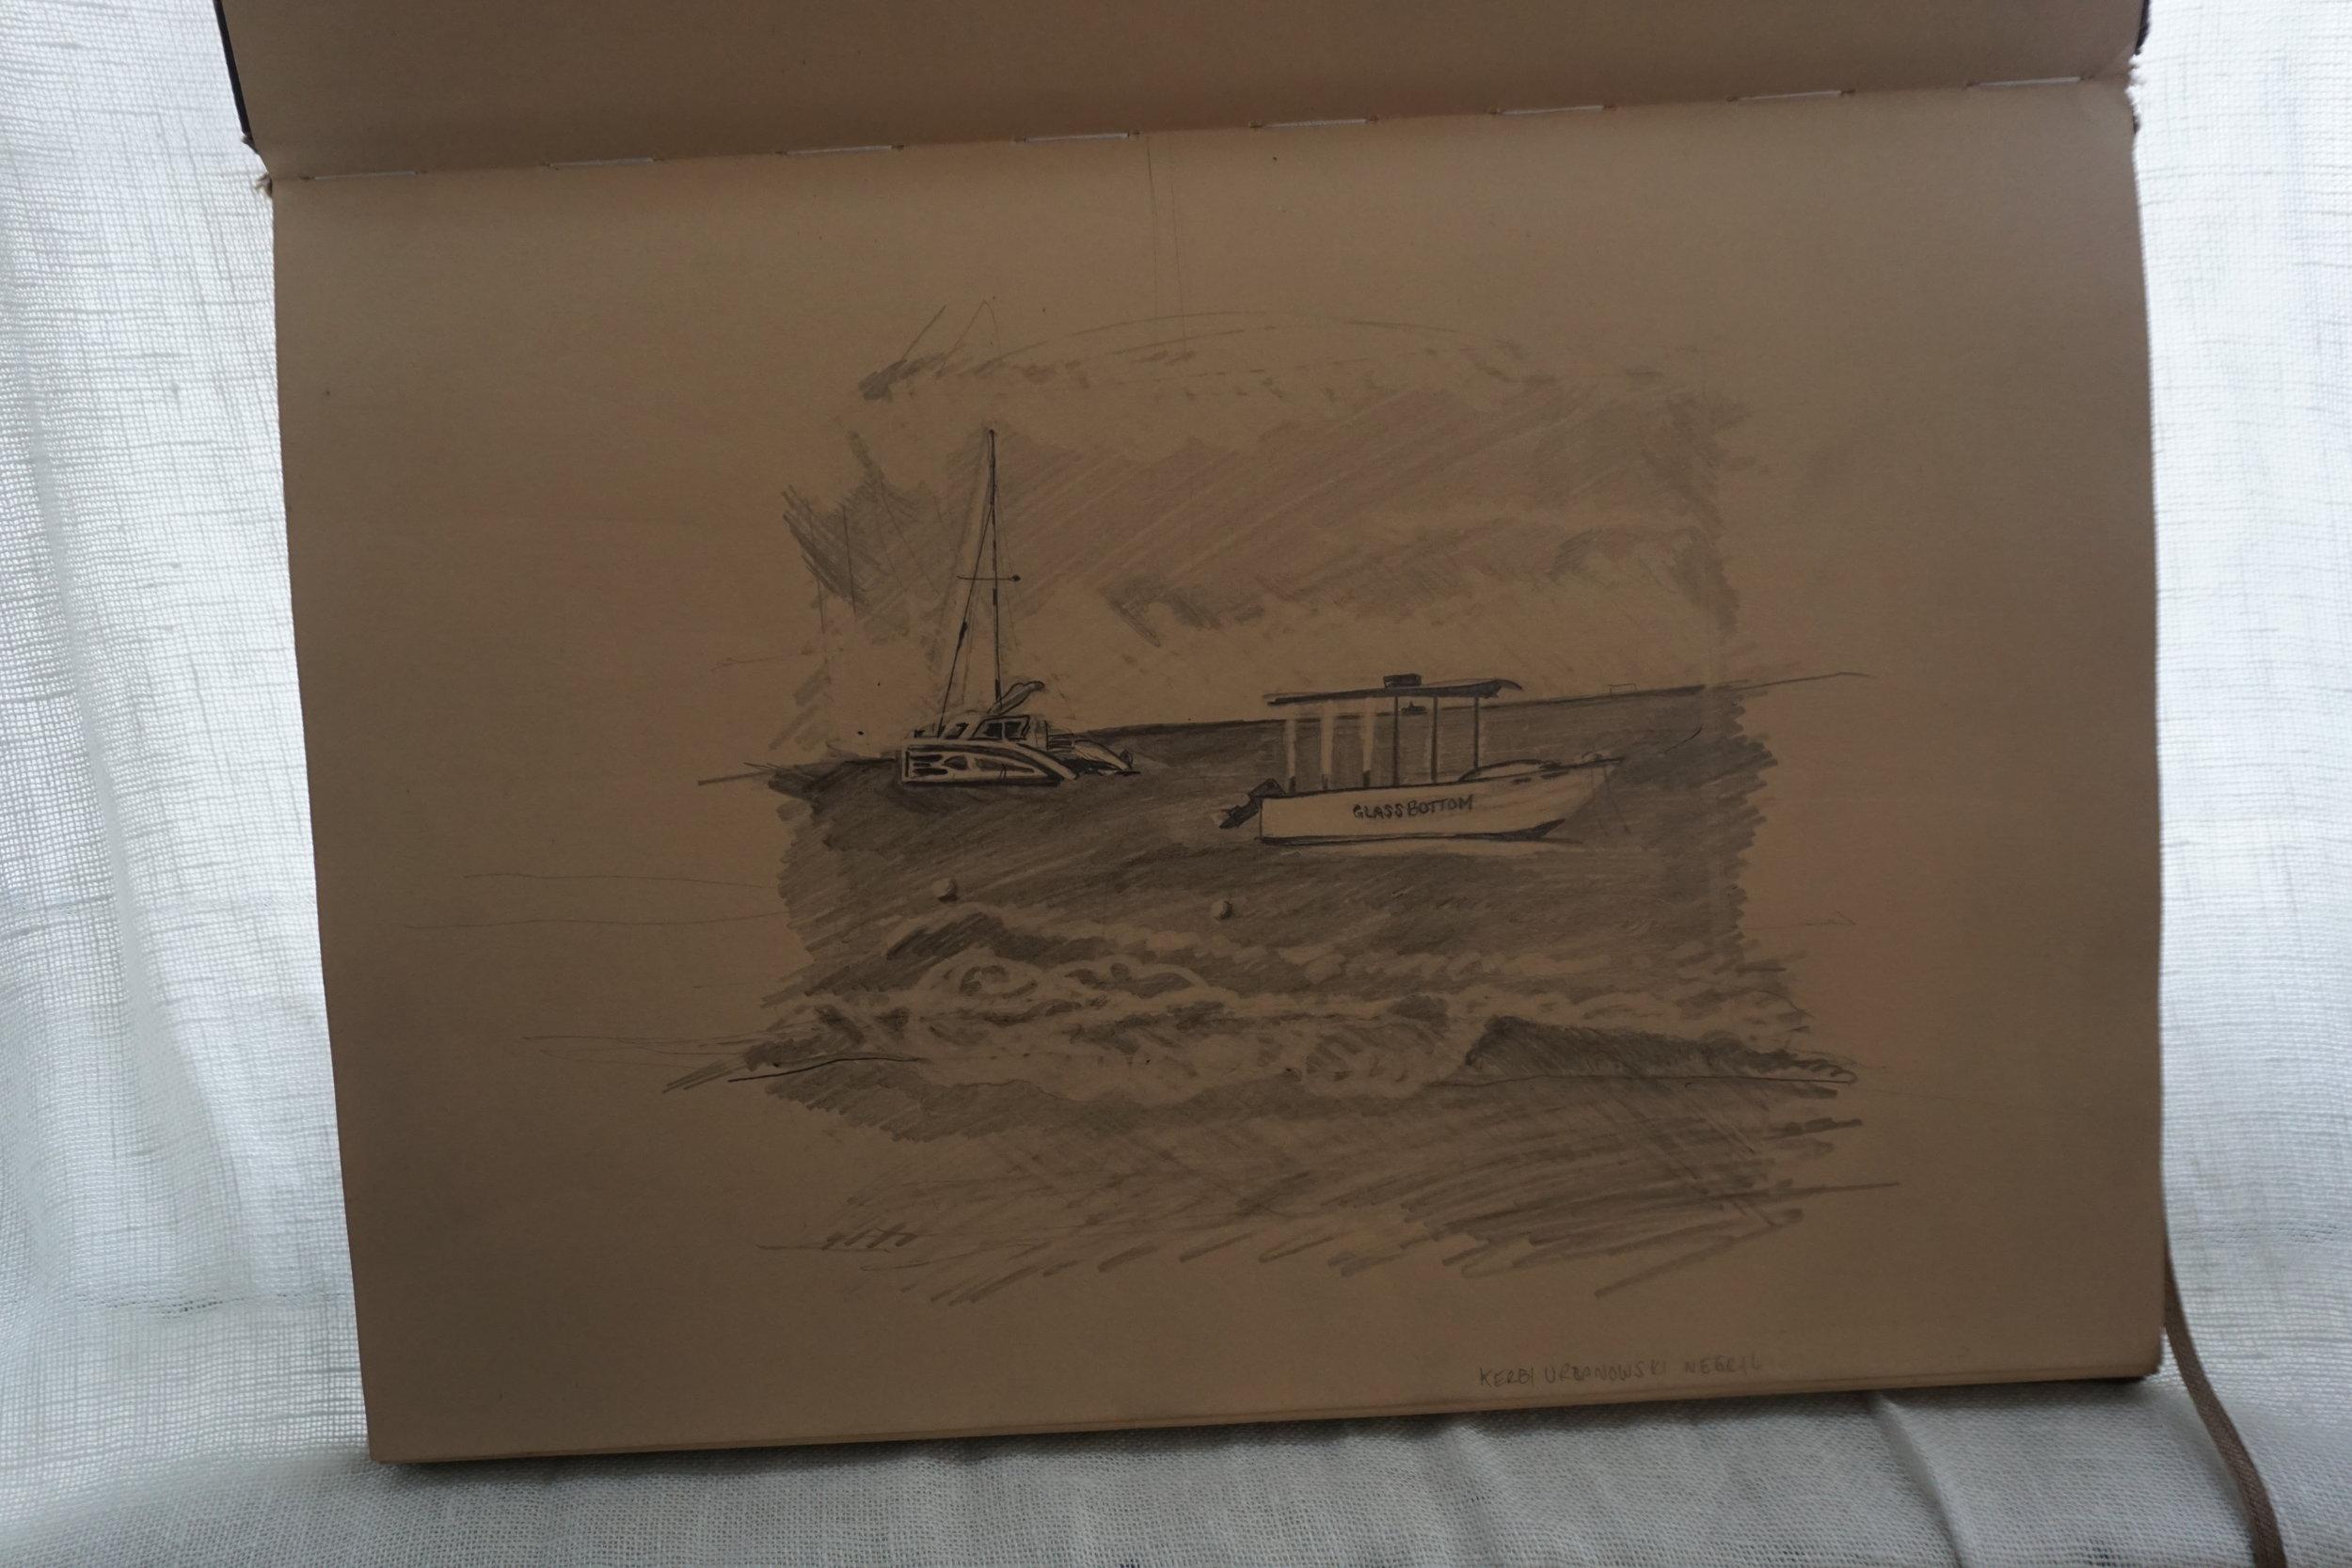 kerbi-urbanowski-bottomless-boat-negril-sketchbook